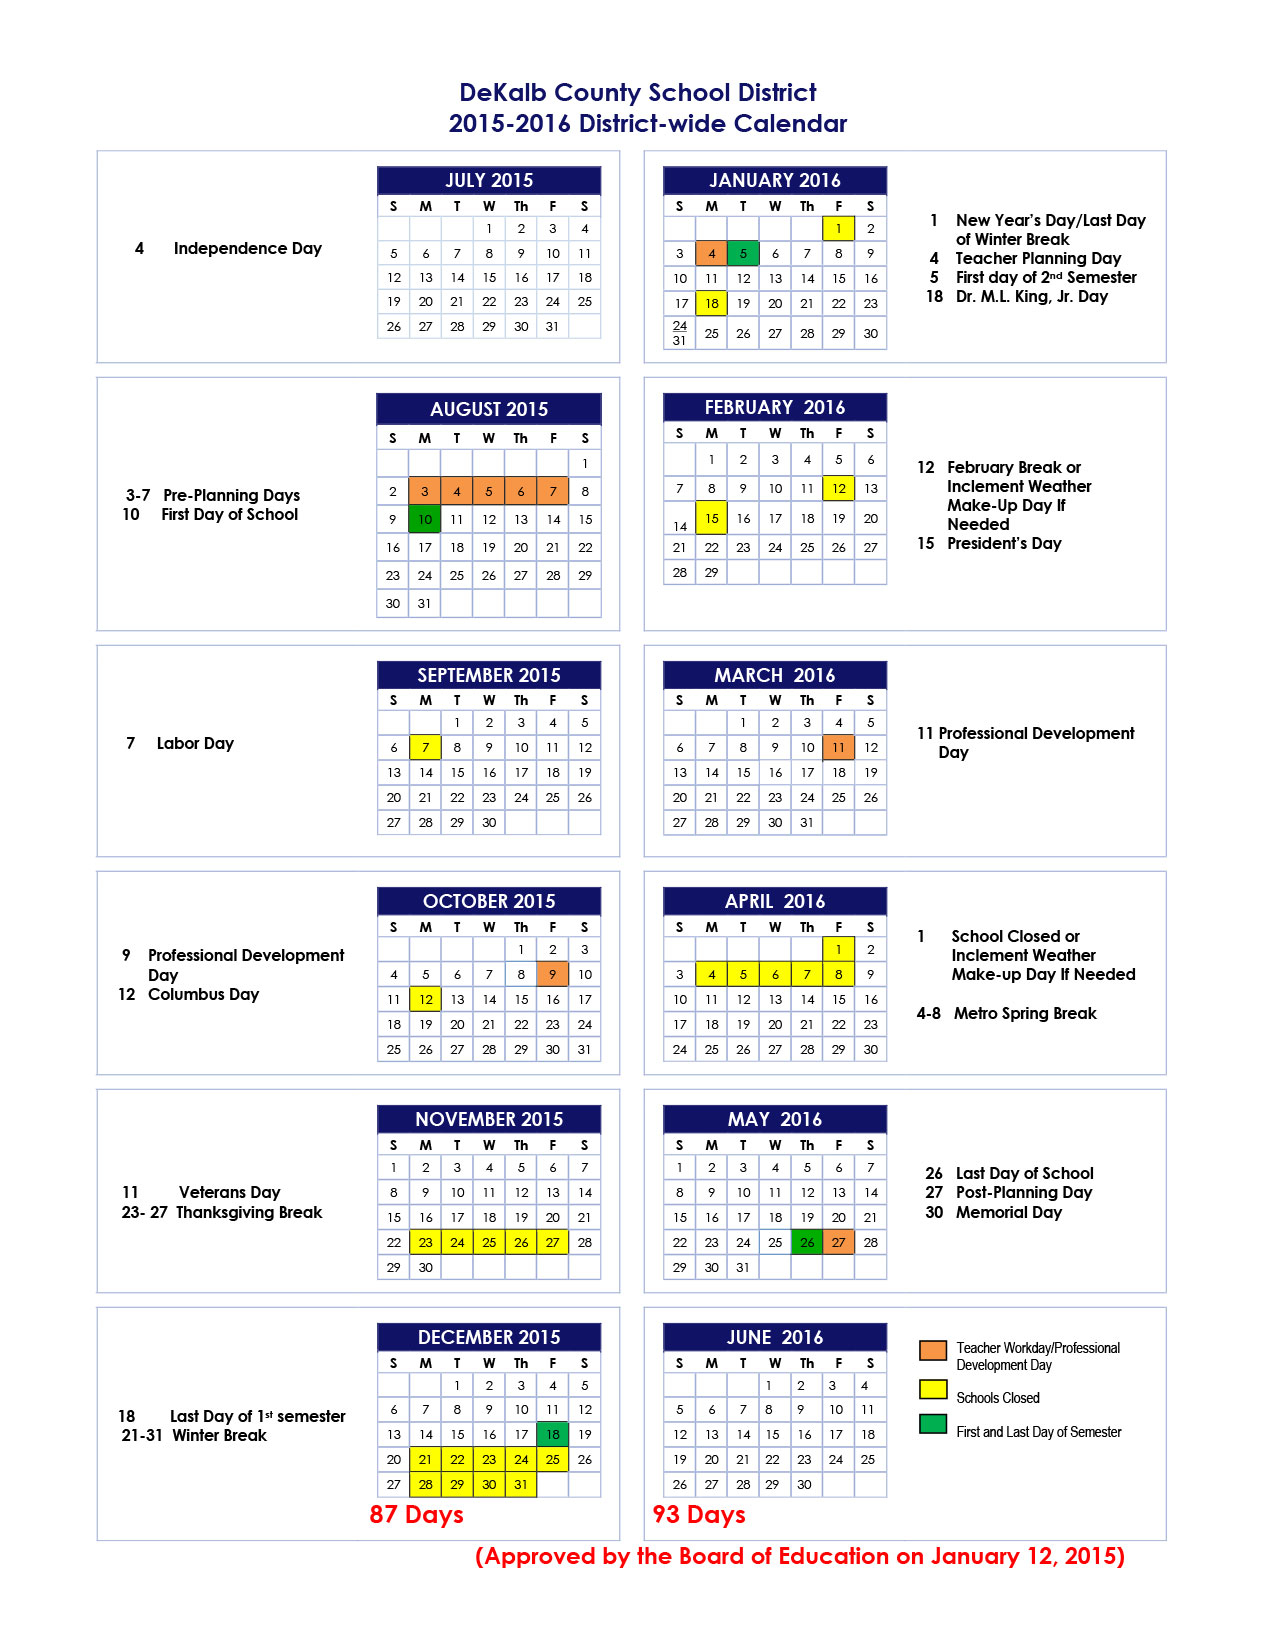 Yangah Solen: Nyc Doe Calendar Regarding 2015 Doe School Calendar